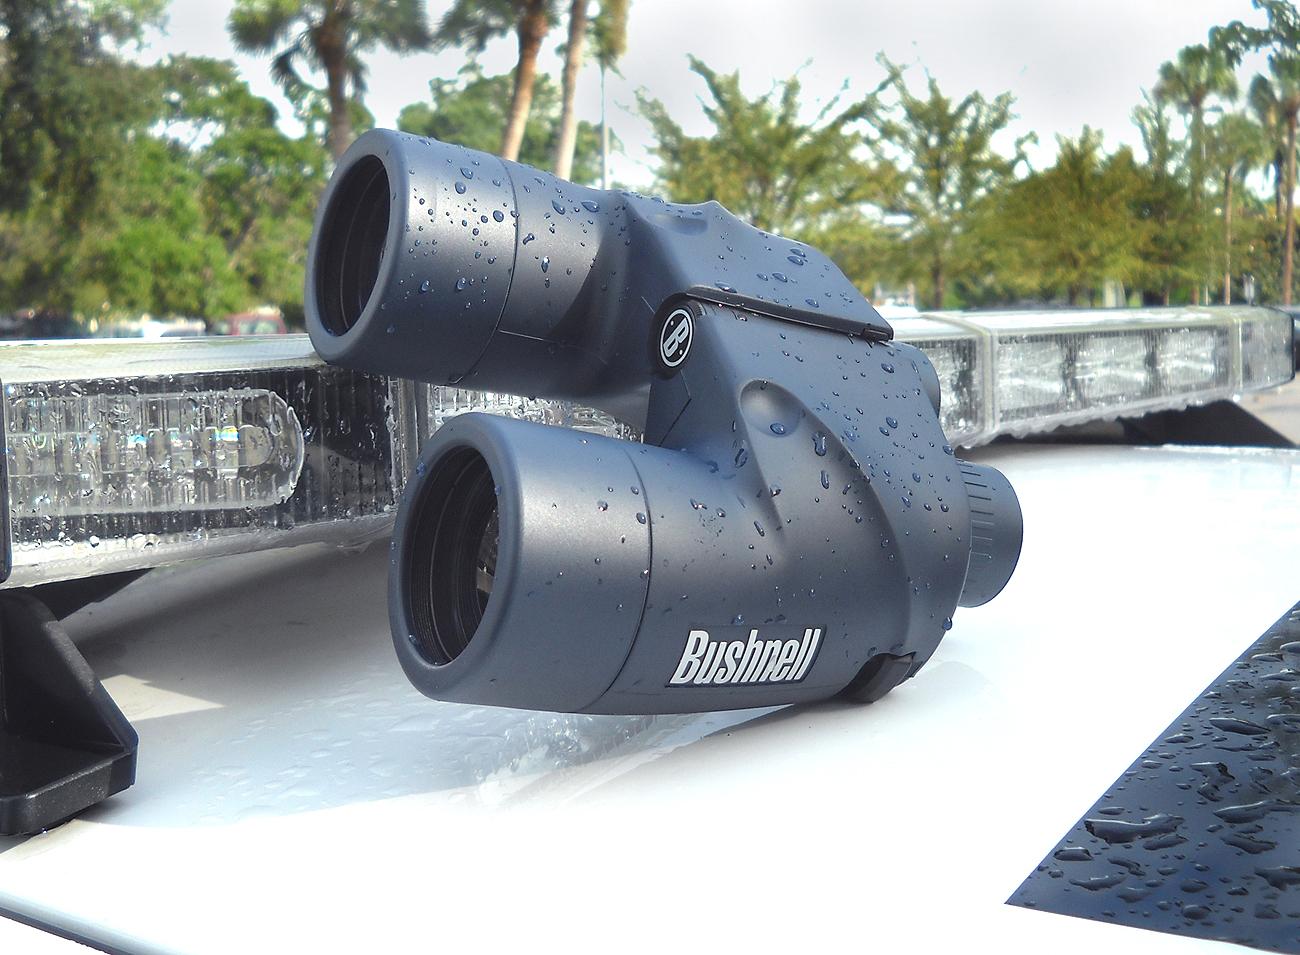 marine bushnell binoculars